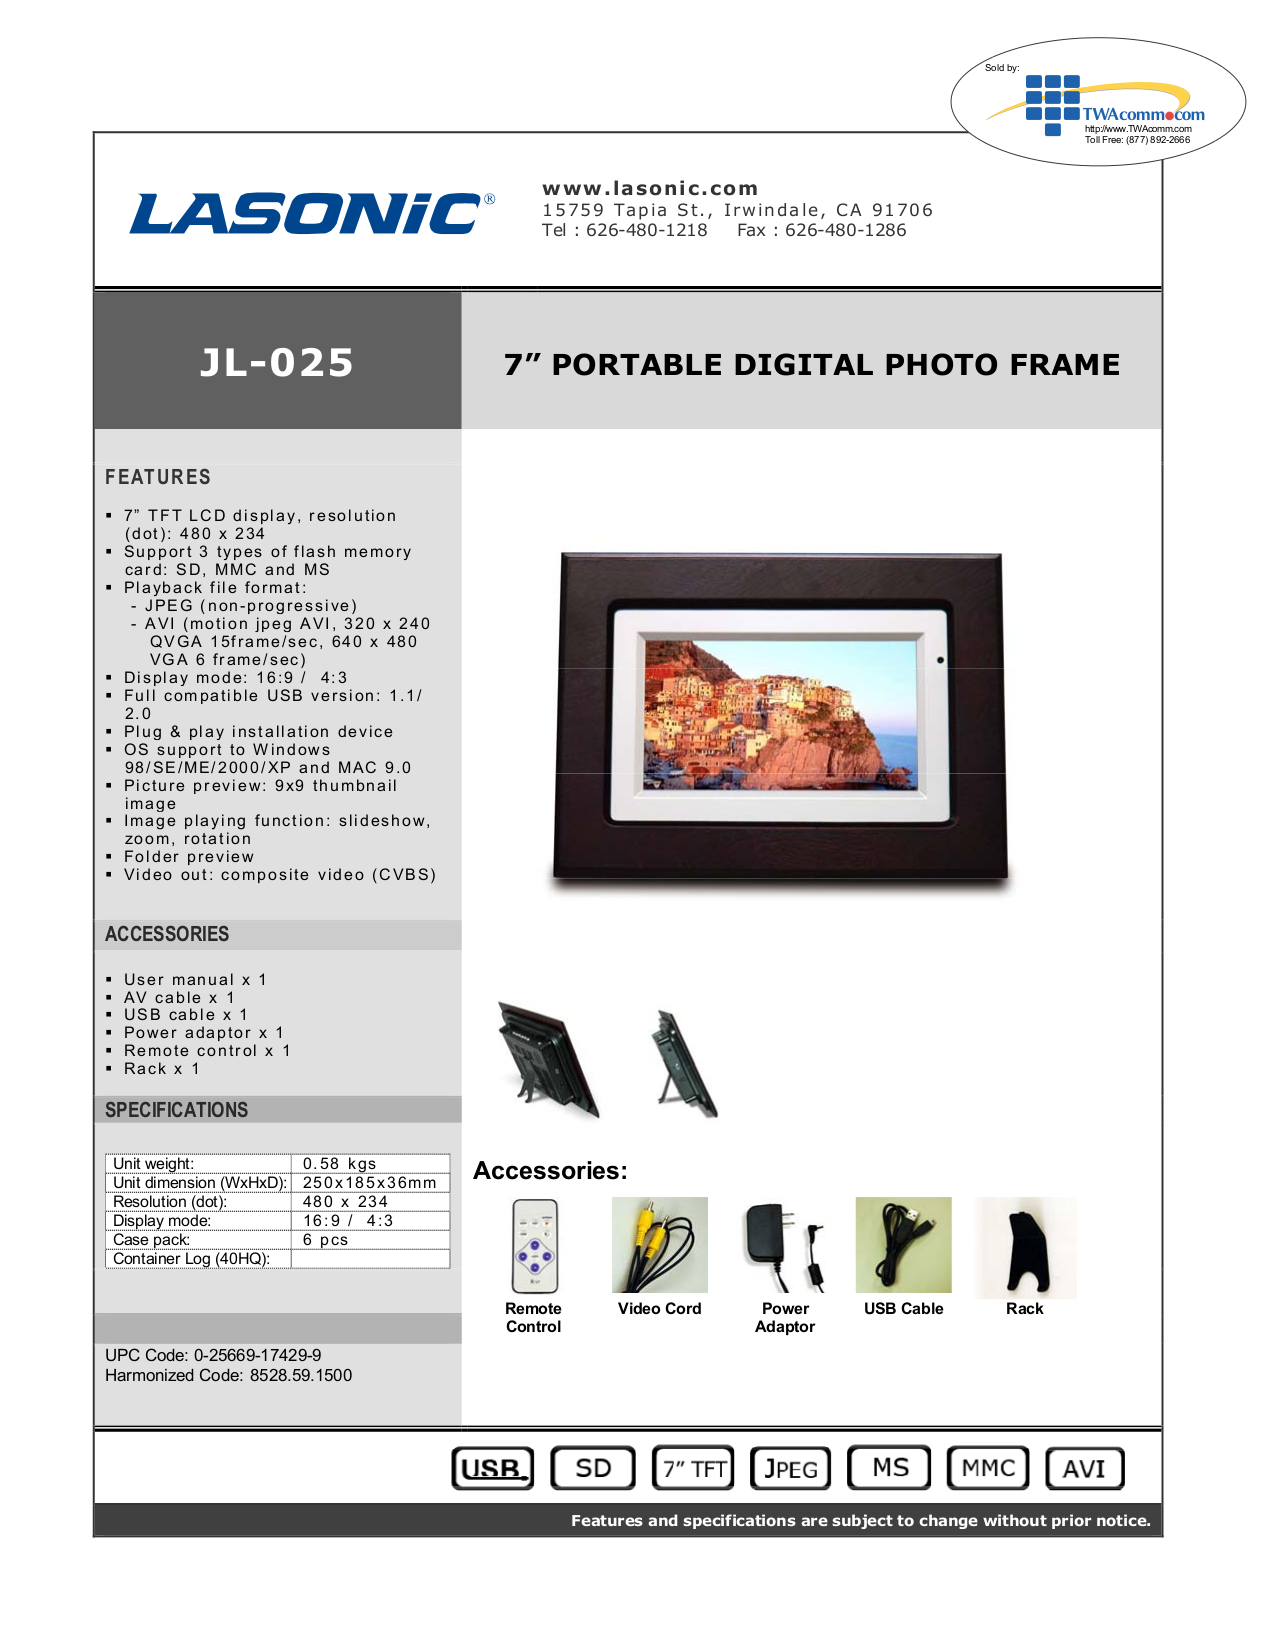 pdf for Lasonic Digital Photo Frame JL-025 manual